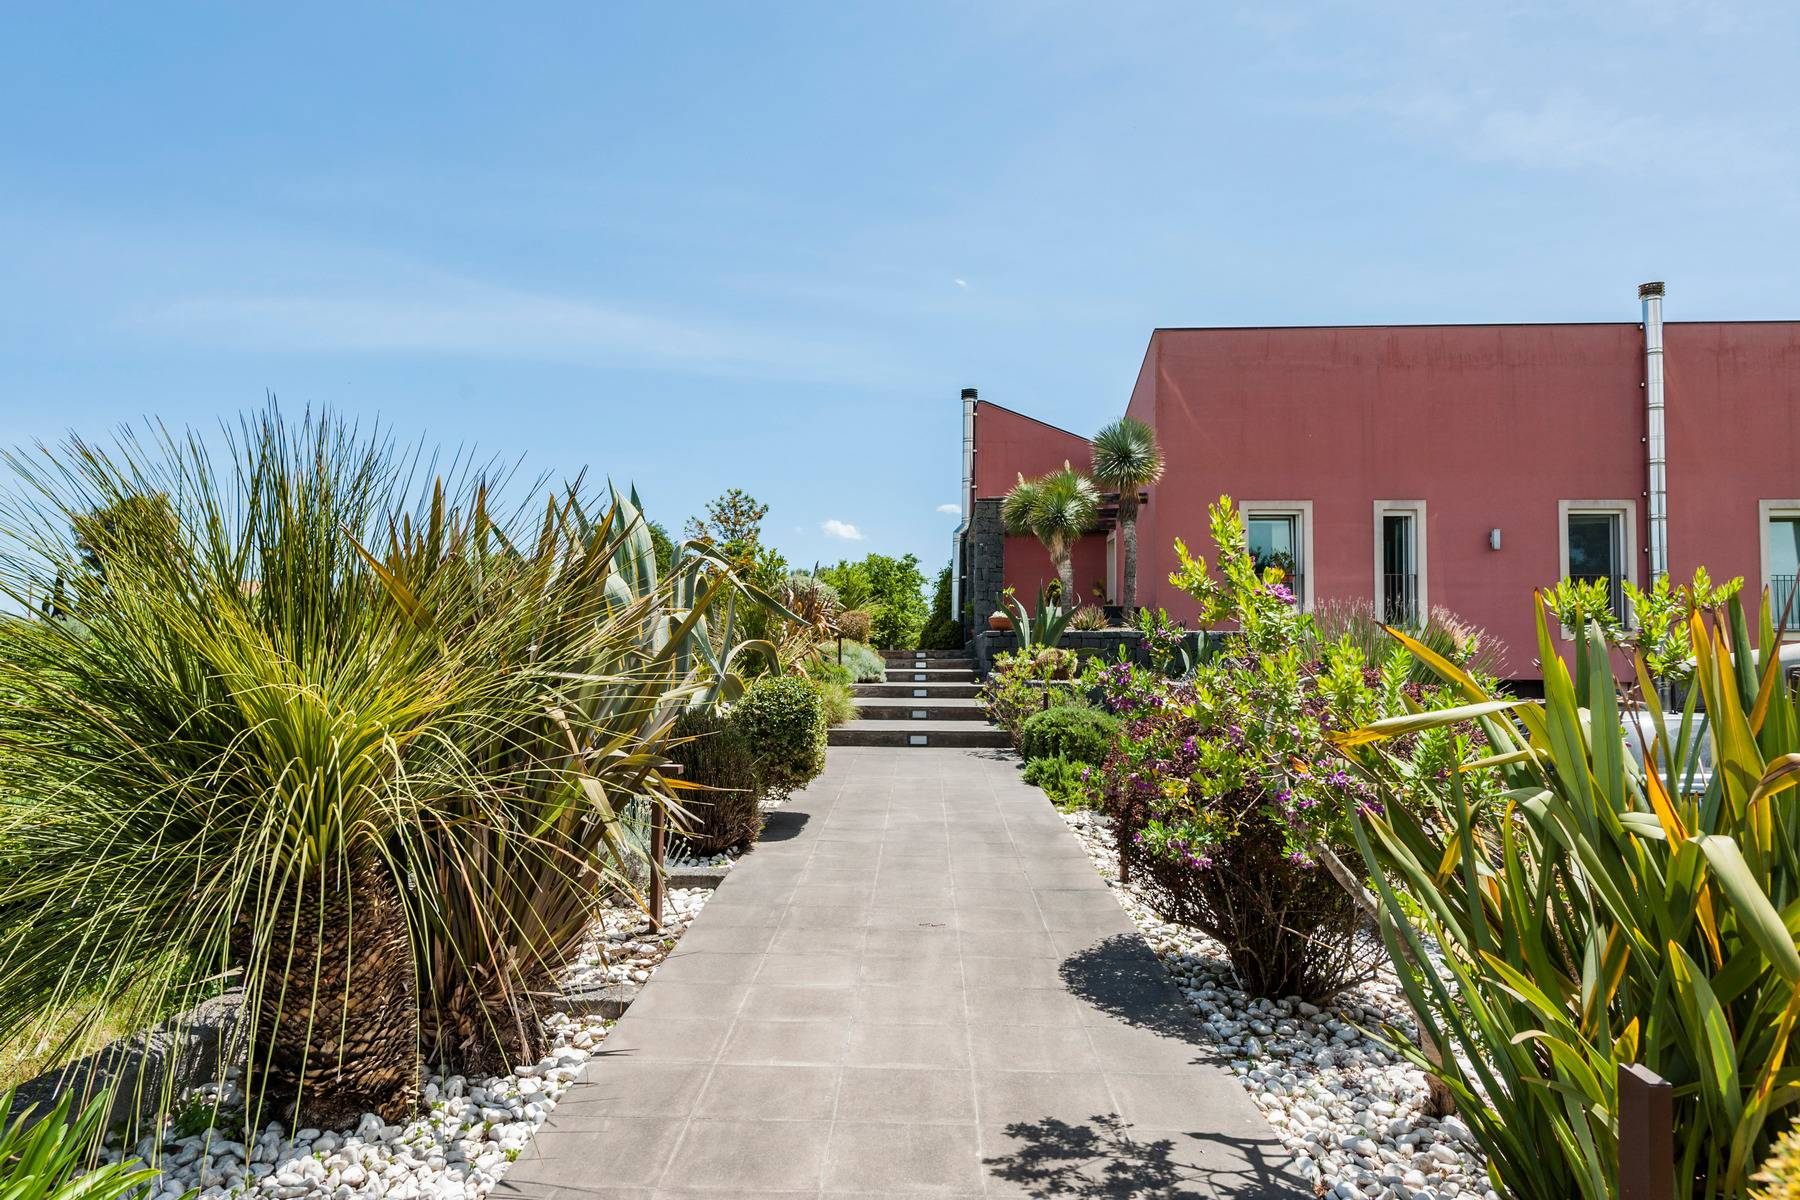 Villa esclusiva con piscina con vista ad Acireale - 23